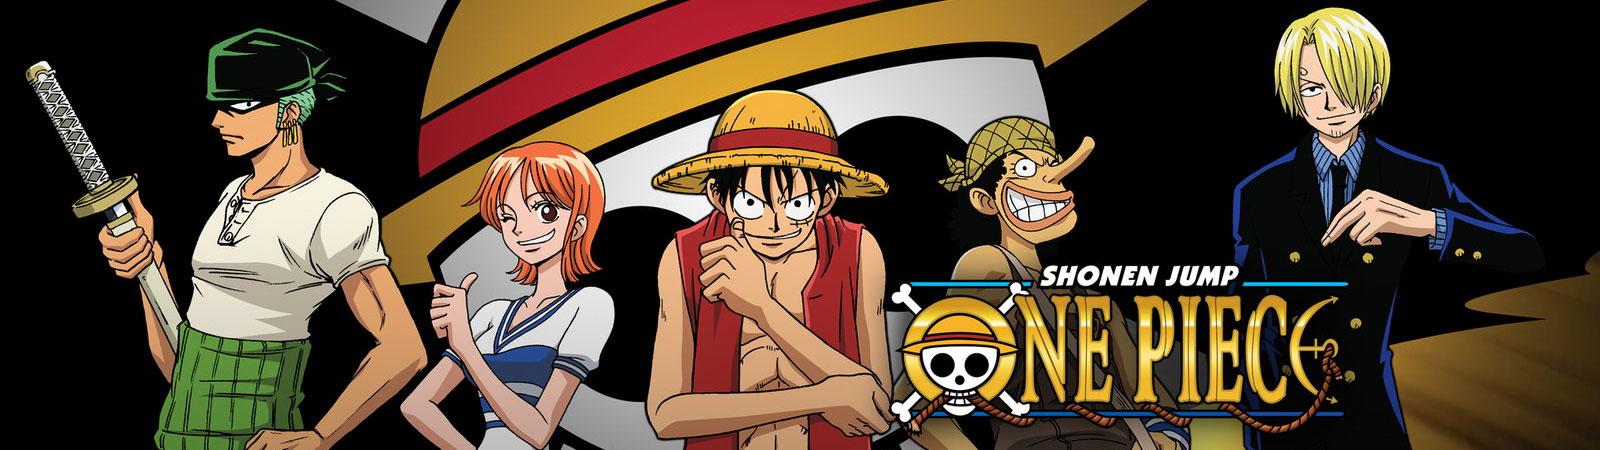 Xem Phim One Piece - Đảo Hải Tặc Việt Sub